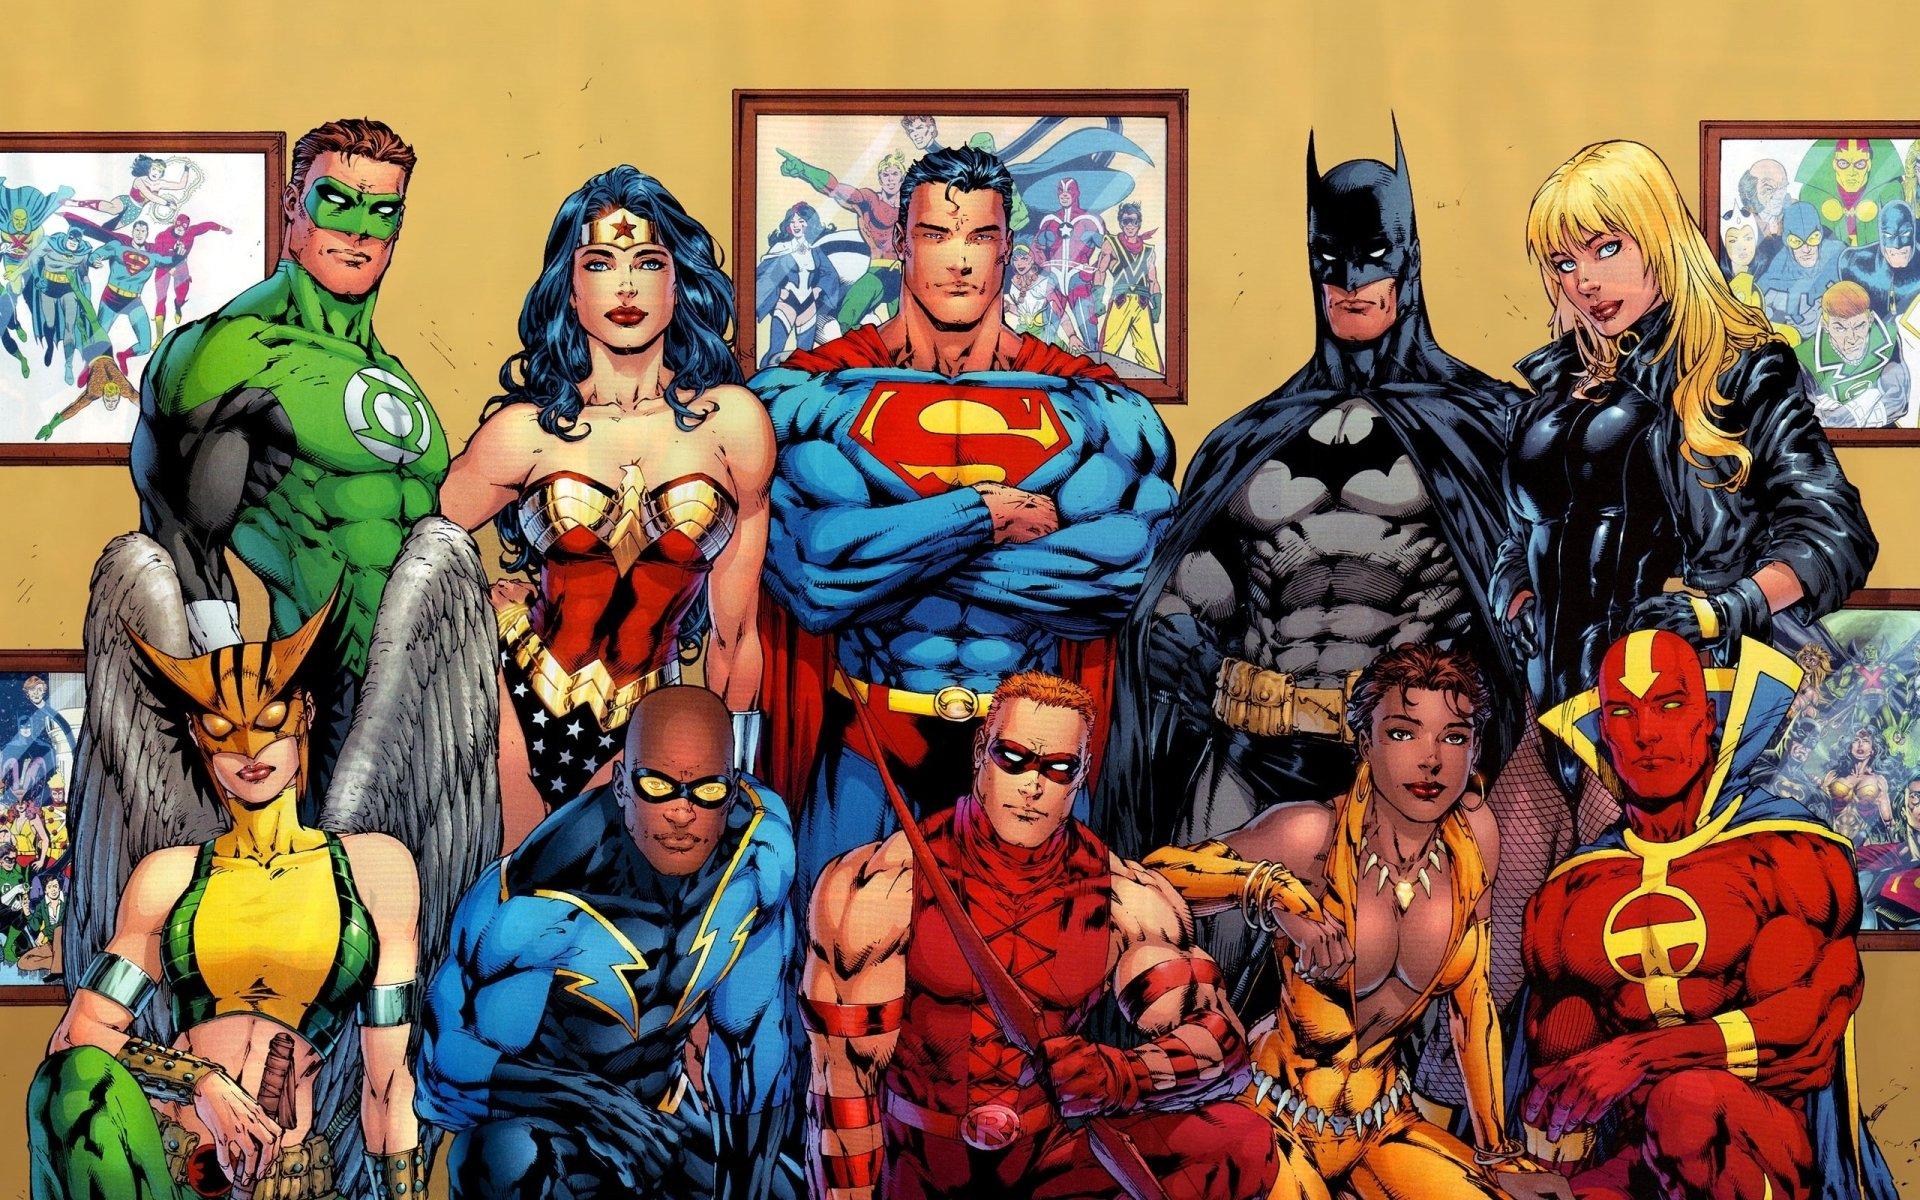 105 Dc Comics Fondos De Pantalla Hd Fondos De Escritorio